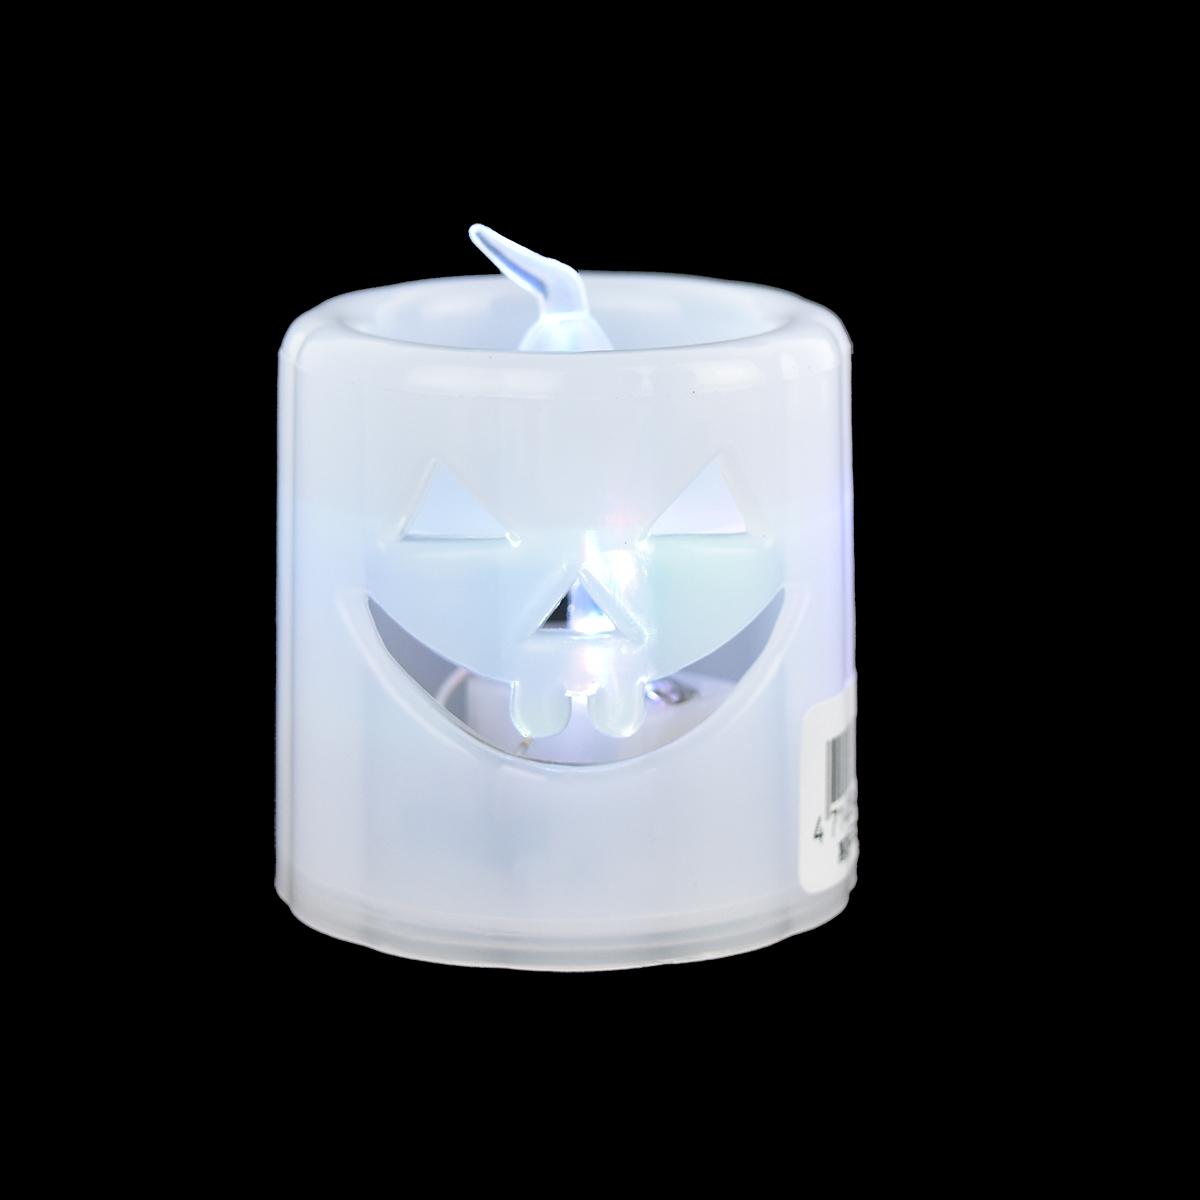 X射線【W397134】萬聖LED造型蠟燭(隨機出貨),萬聖節/蠟燭/佈置/裝飾/擺飾/會場佈置/燈籠/聲光/花燈/店面裝飾/道具/鬼臉/發光